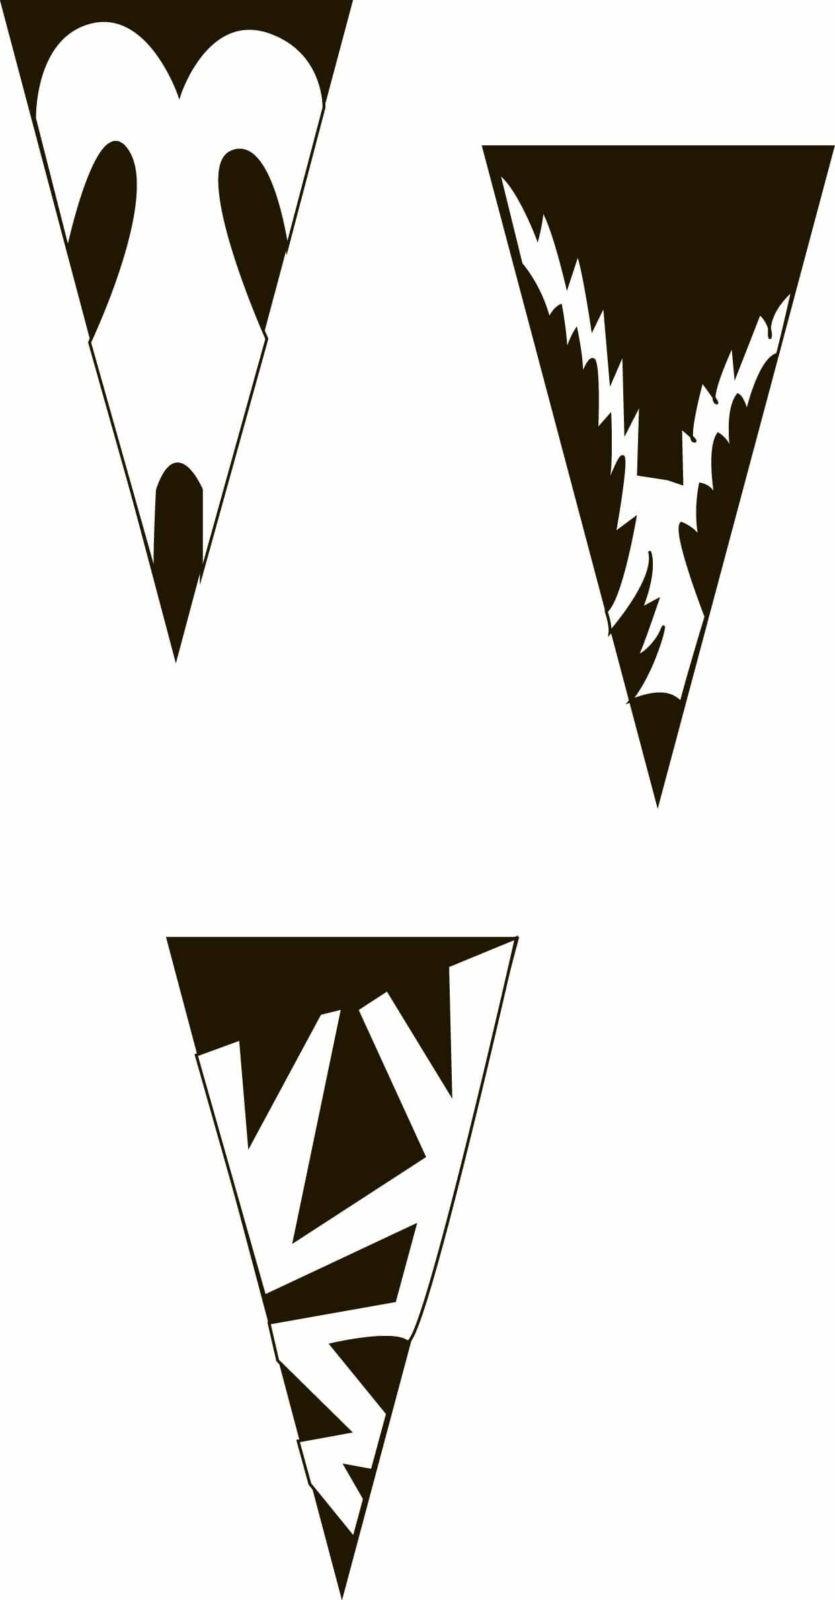 Снежинки-балеринки из бумаги: шаблон 4